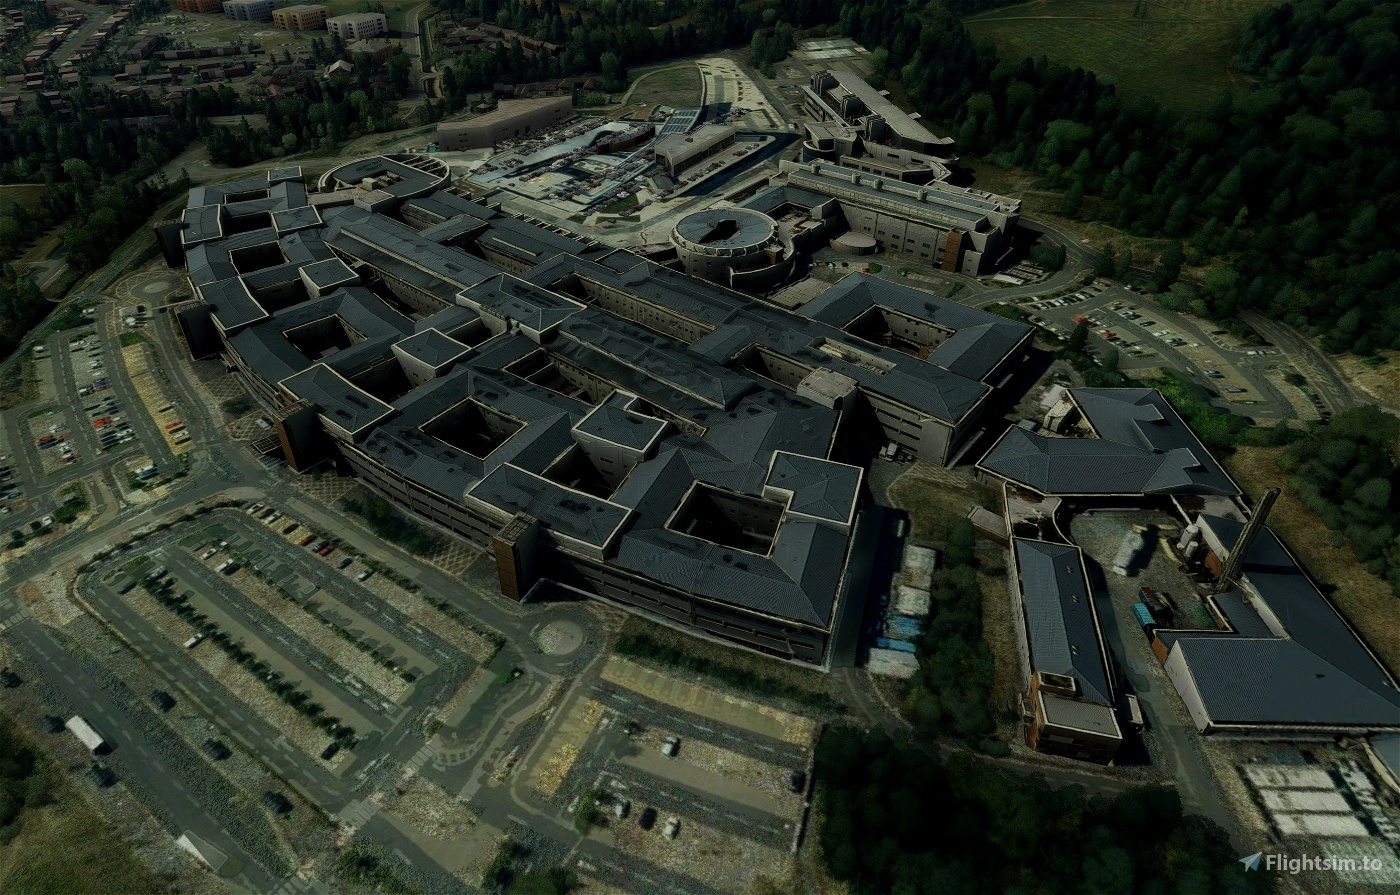 Royal Infirmary of Edinburgh | Edinburgh, UK